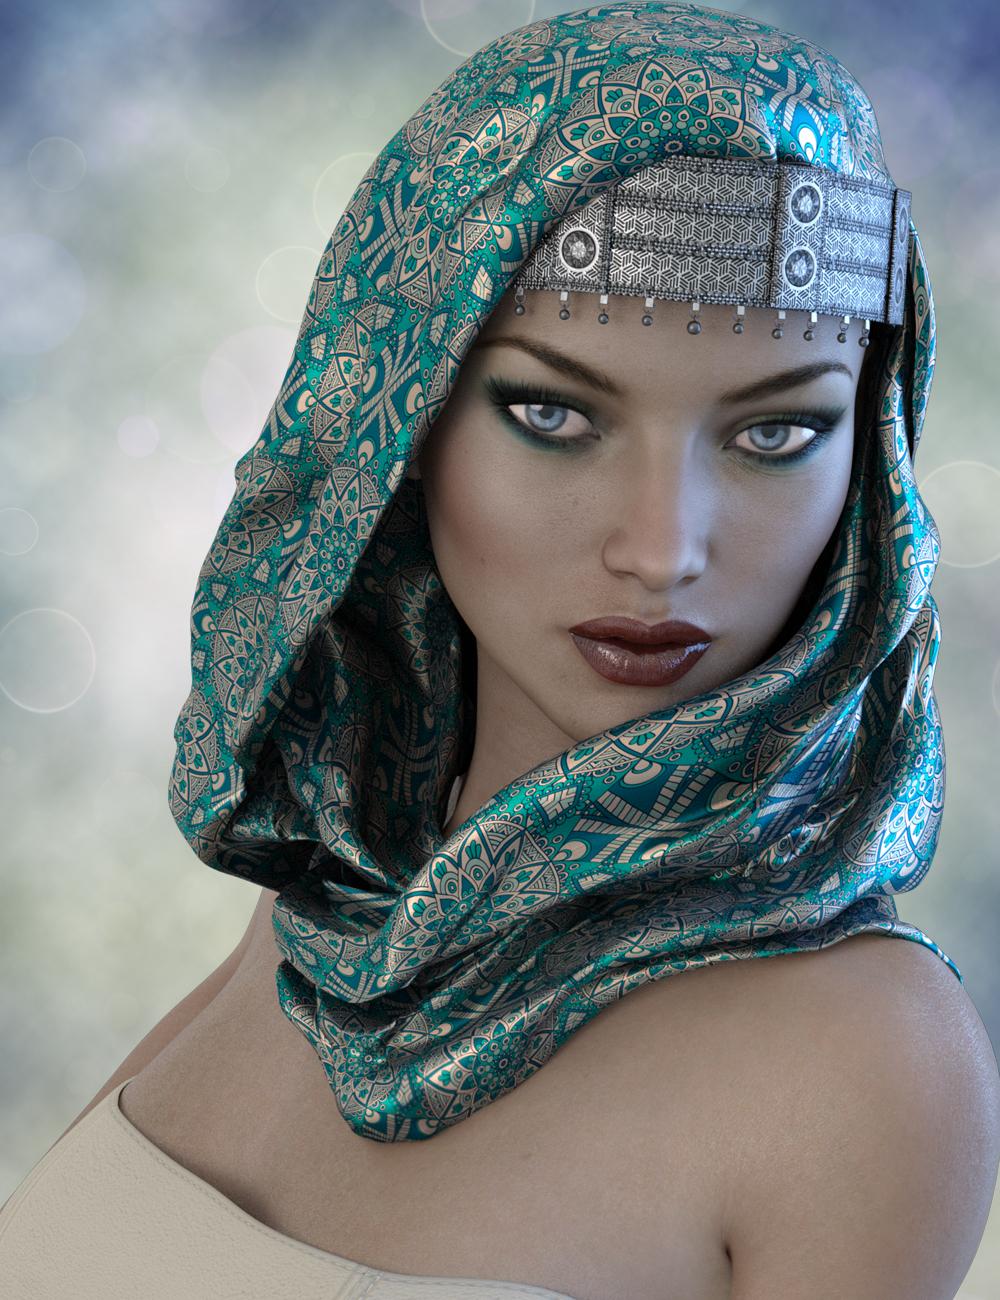 X-Fashion Turban Scarf for Genesis 3 Female(s) by: xtrart-3d, 3D Models by Daz 3D